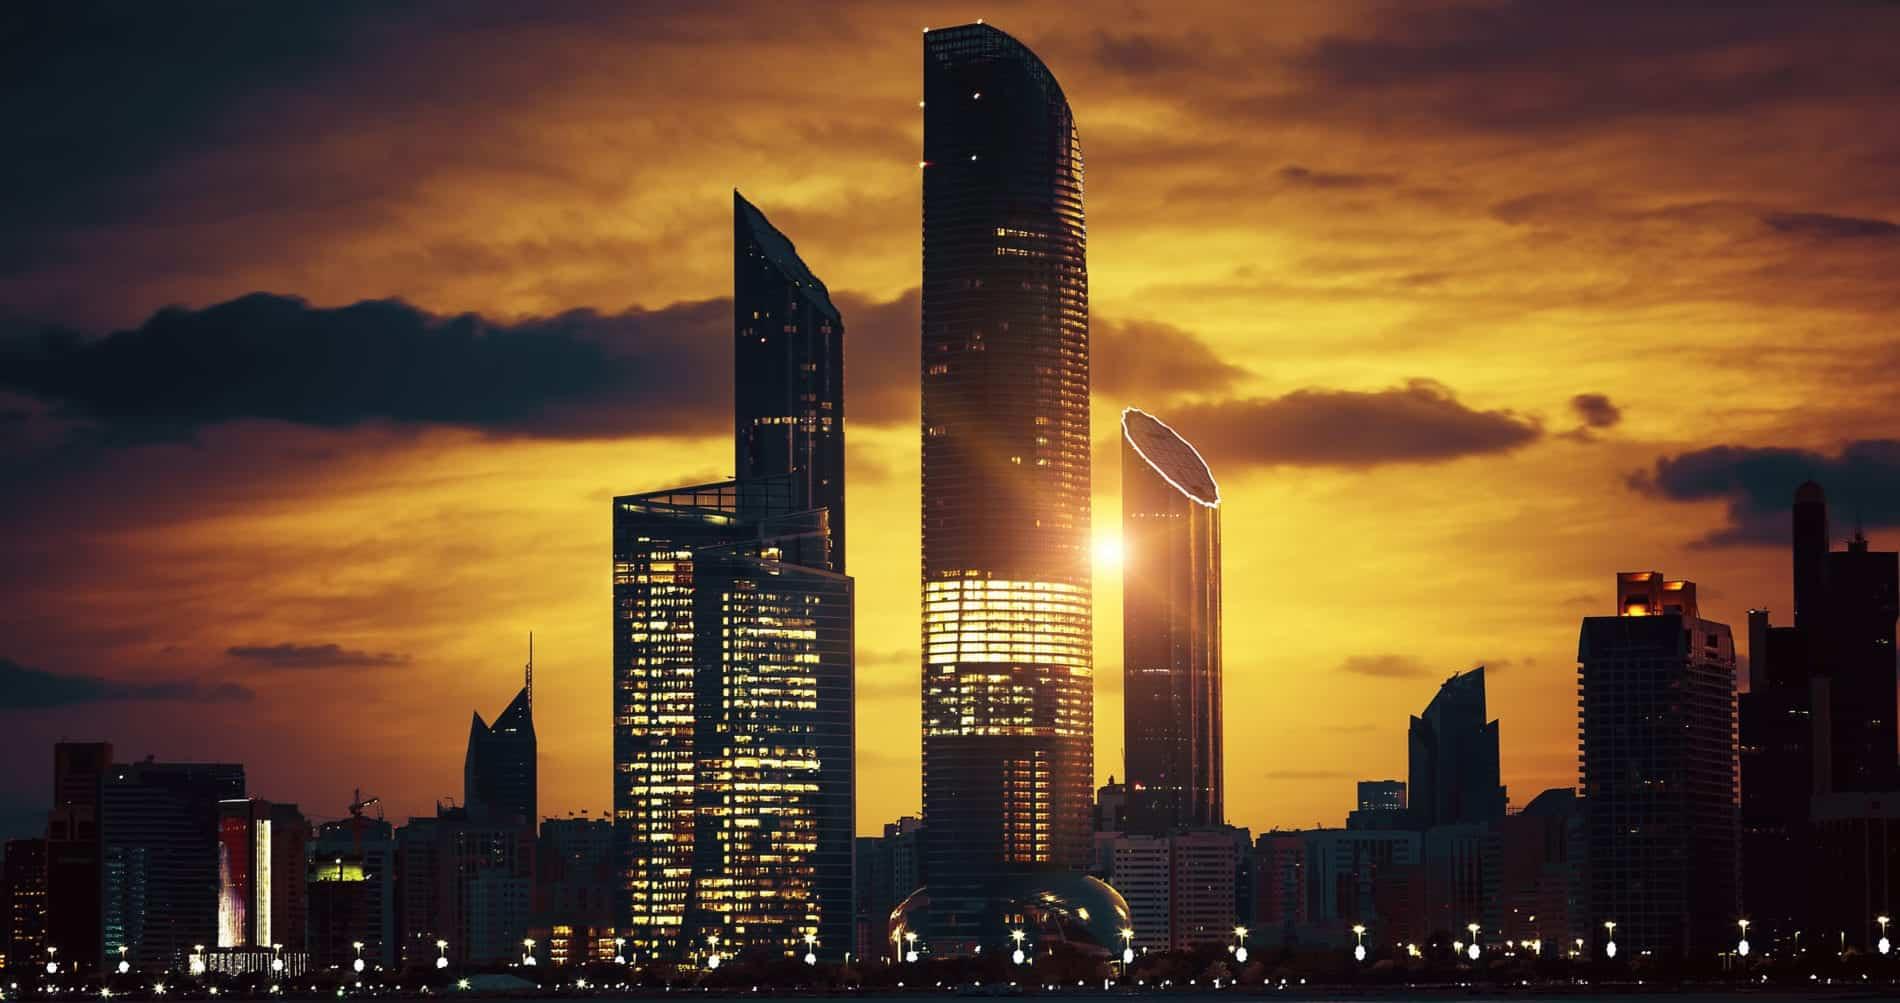 Abu Dhabi Skyline at sunset - Holiday